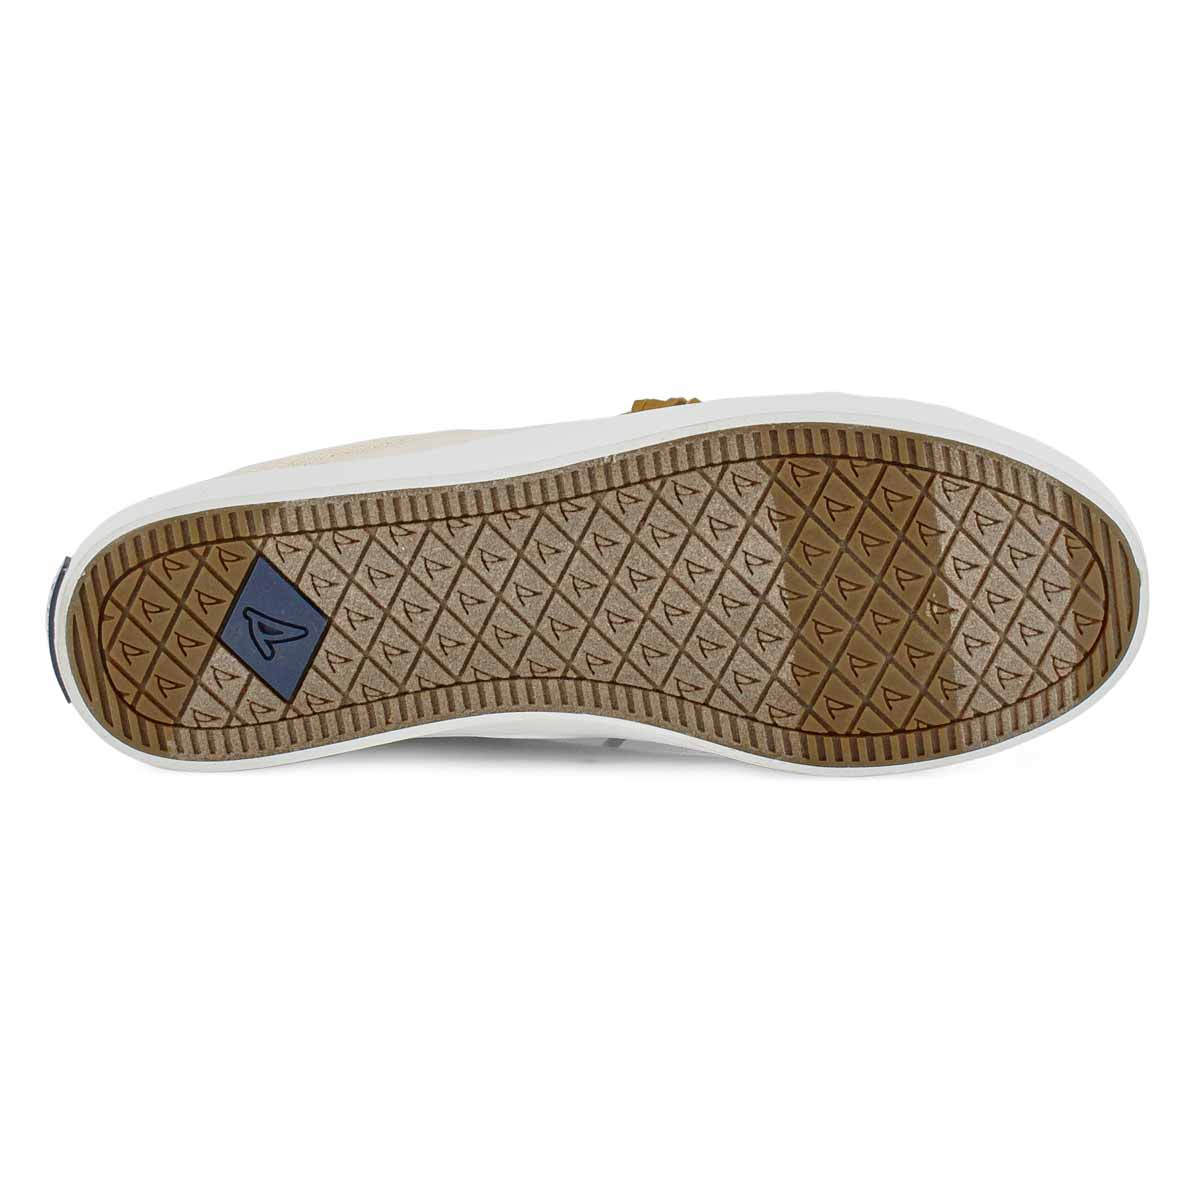 Lds Crest Vibe Linen oat fashion sneaker